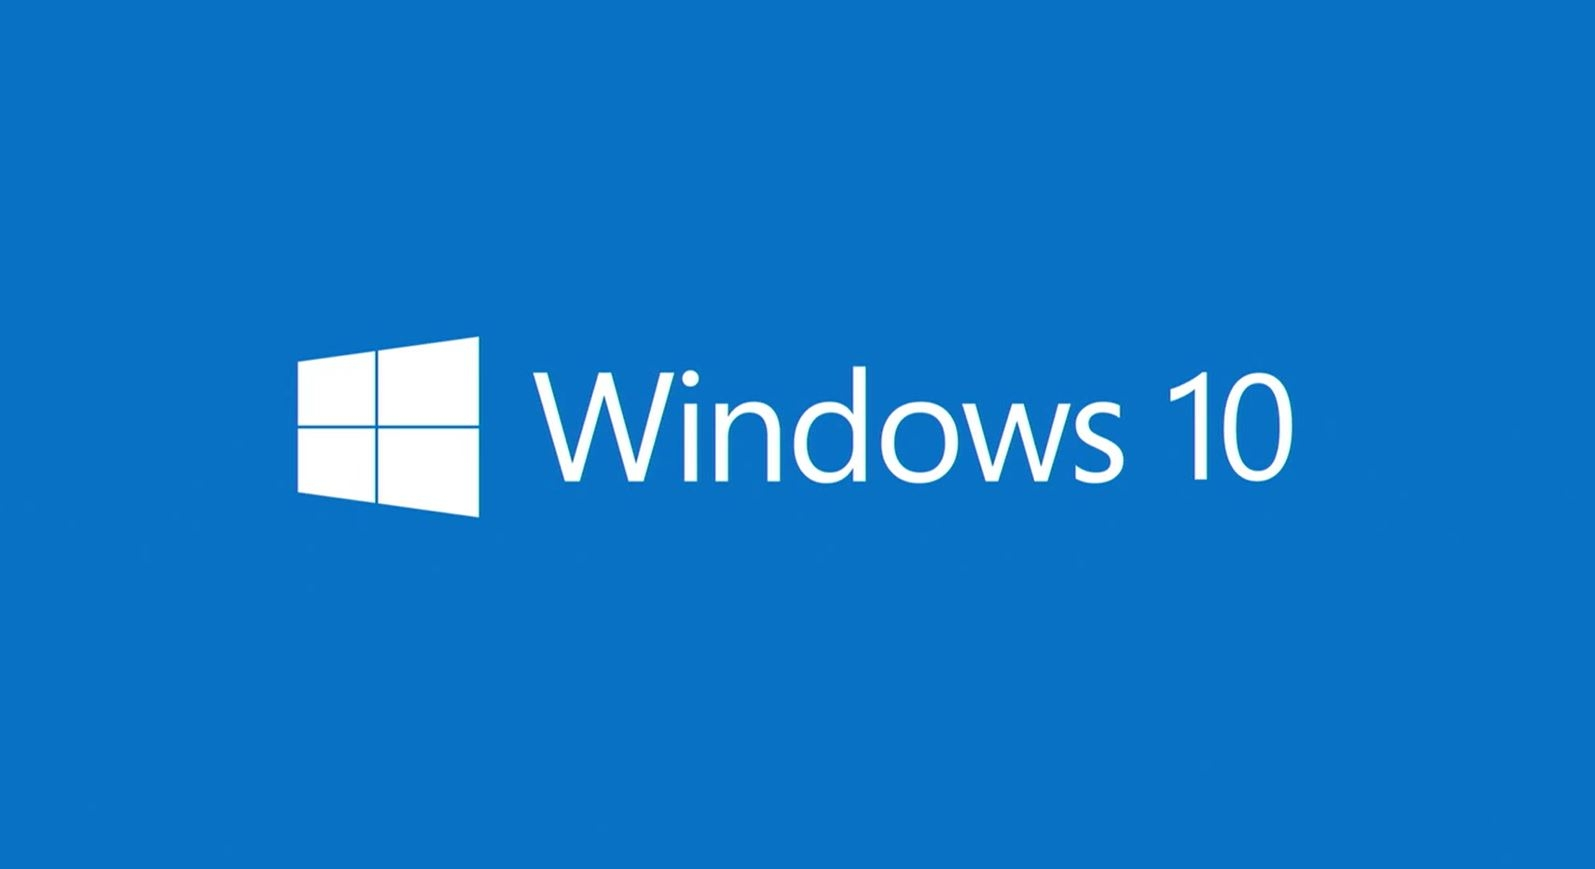 Windows 10 RUS/ENG AIO 2016 [x32/x64]